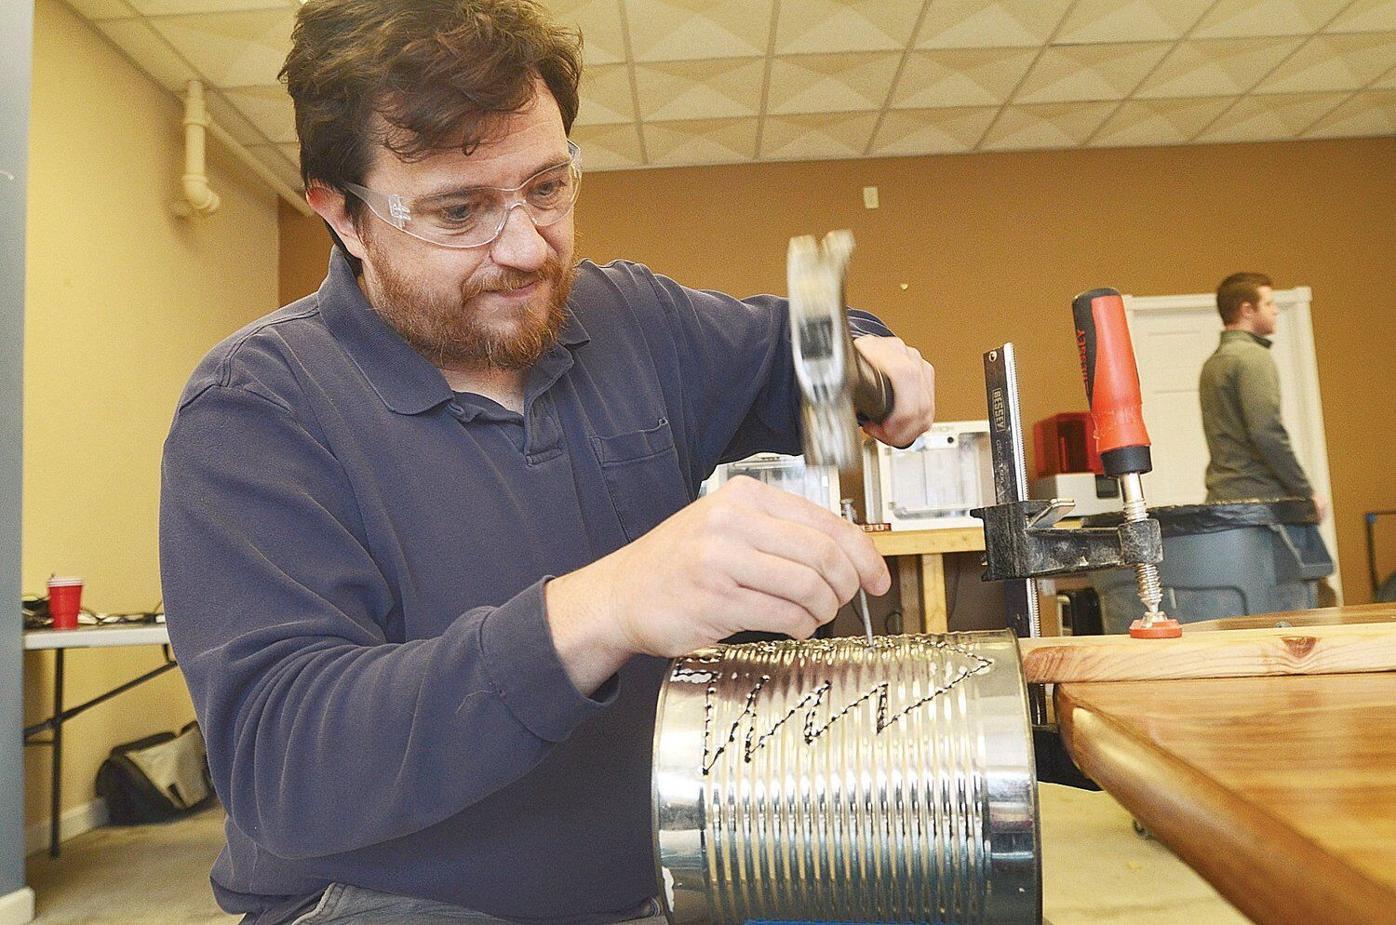 Community 'makerspace' opens in Bennington